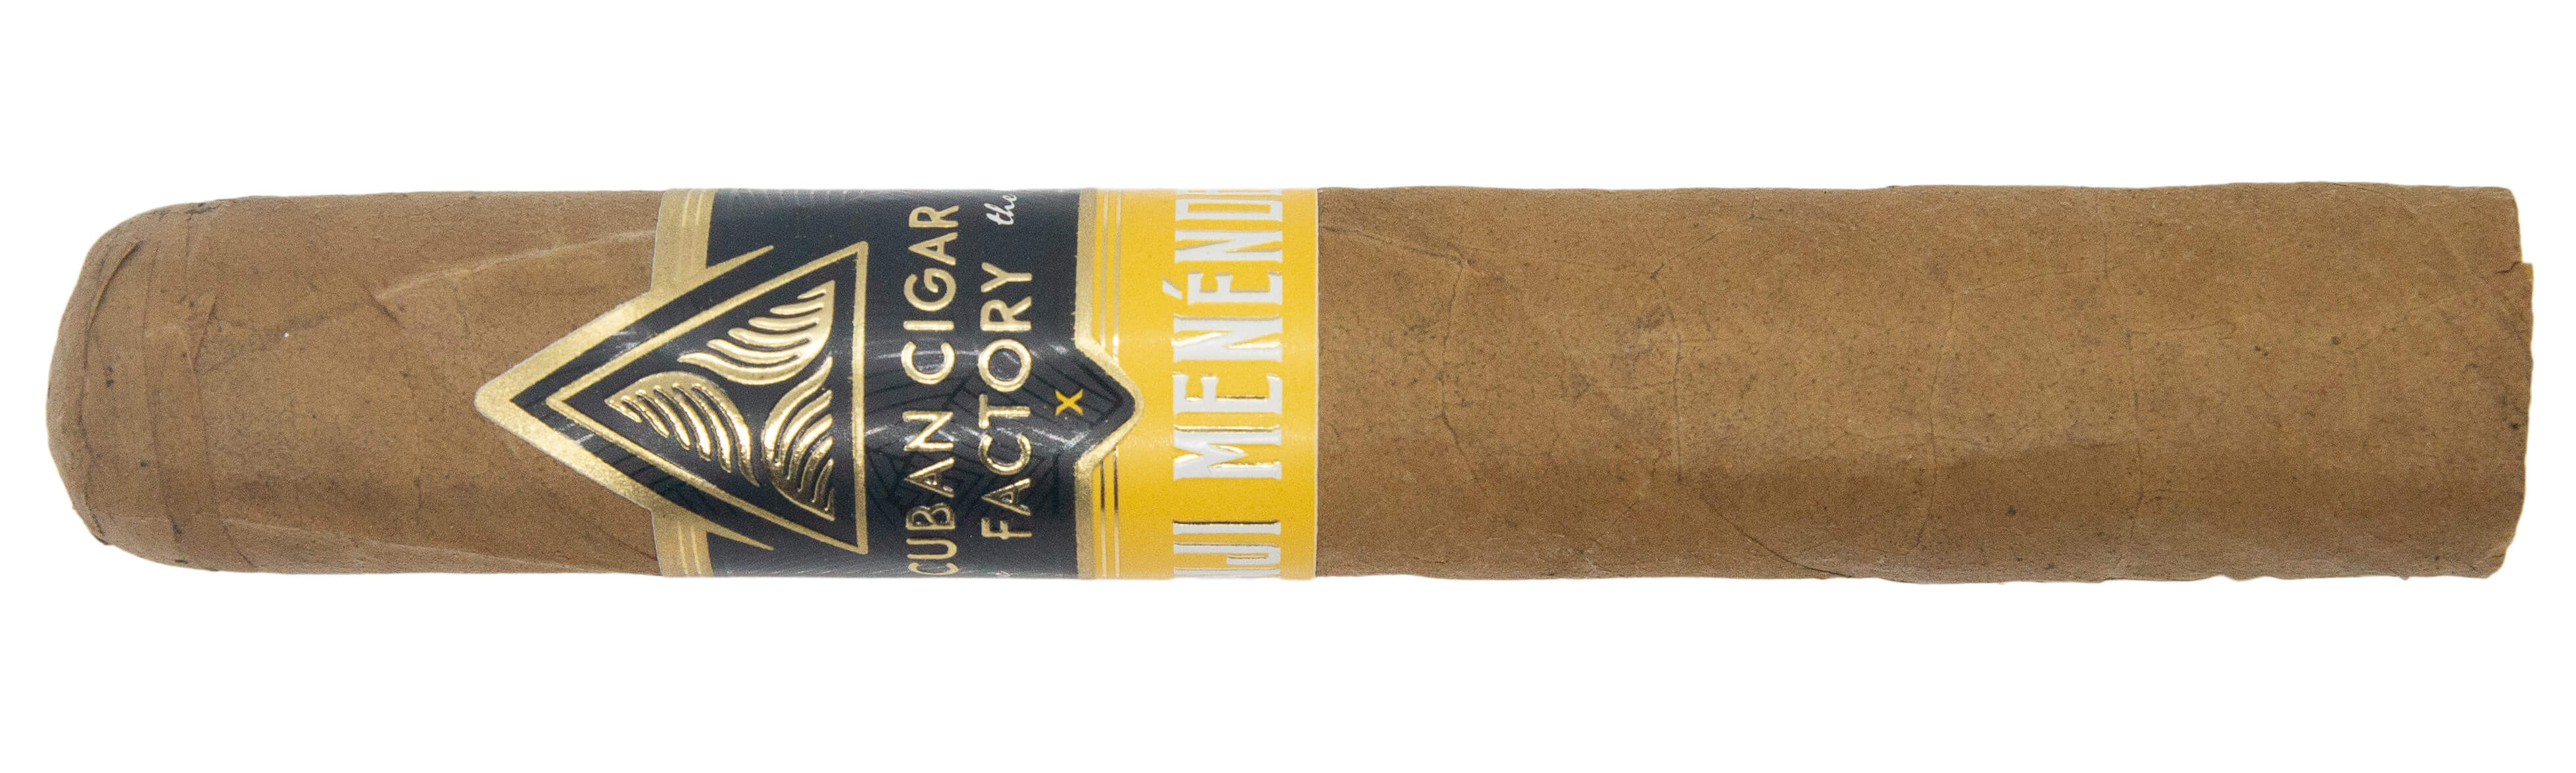 Blind Cigar Review: Ventura | Cuban Cigar Factory Benji Menendez Robusto